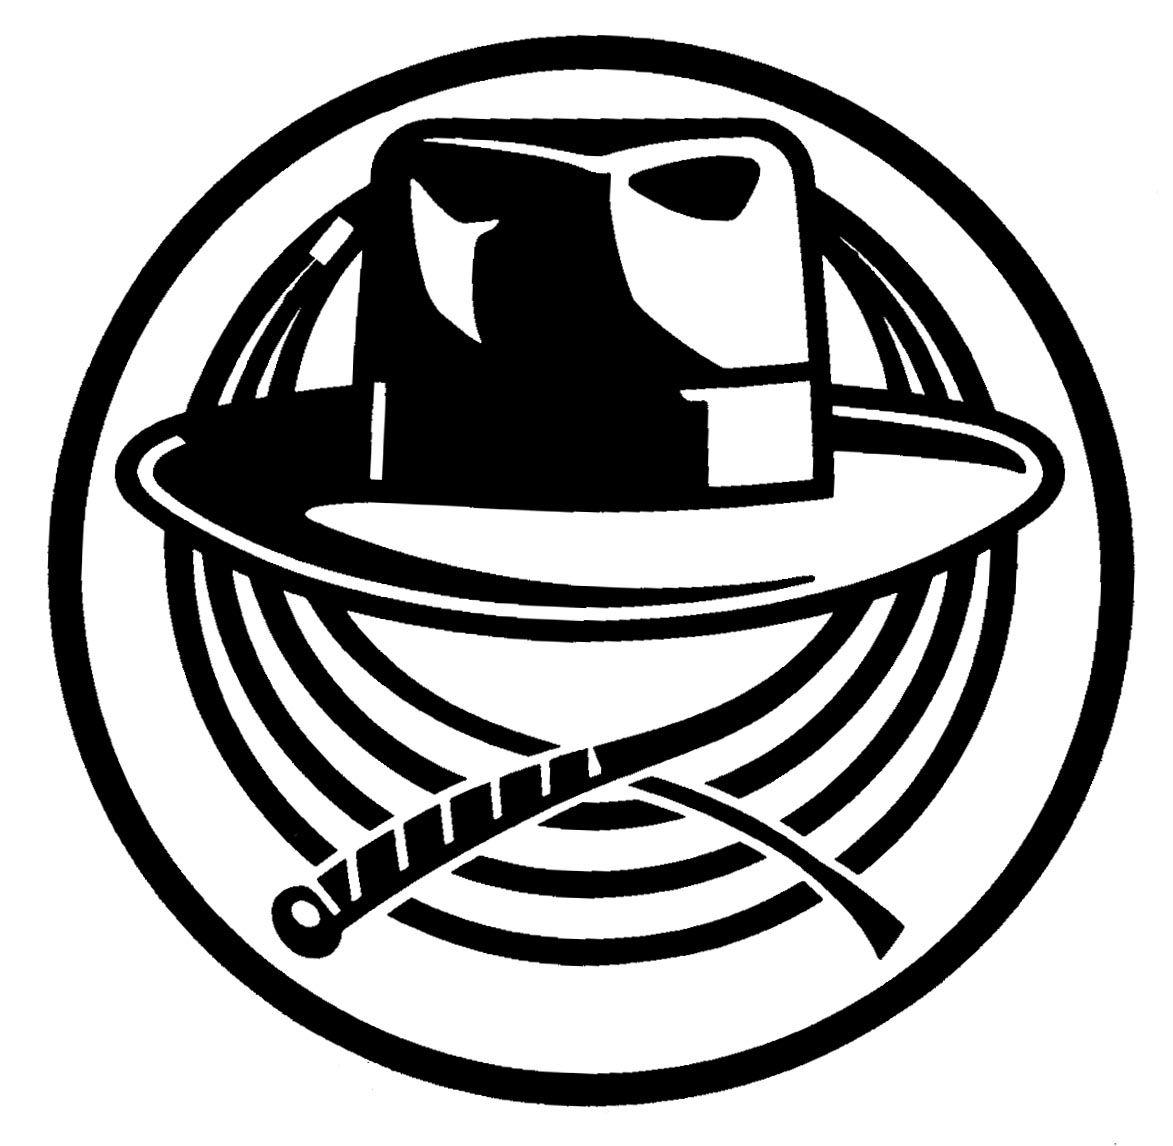 Indiana jones hat clipart vector royalty free download Hat & Whip Logo | Indiana Jones in 2019 | Indiana jones party ... vector royalty free download